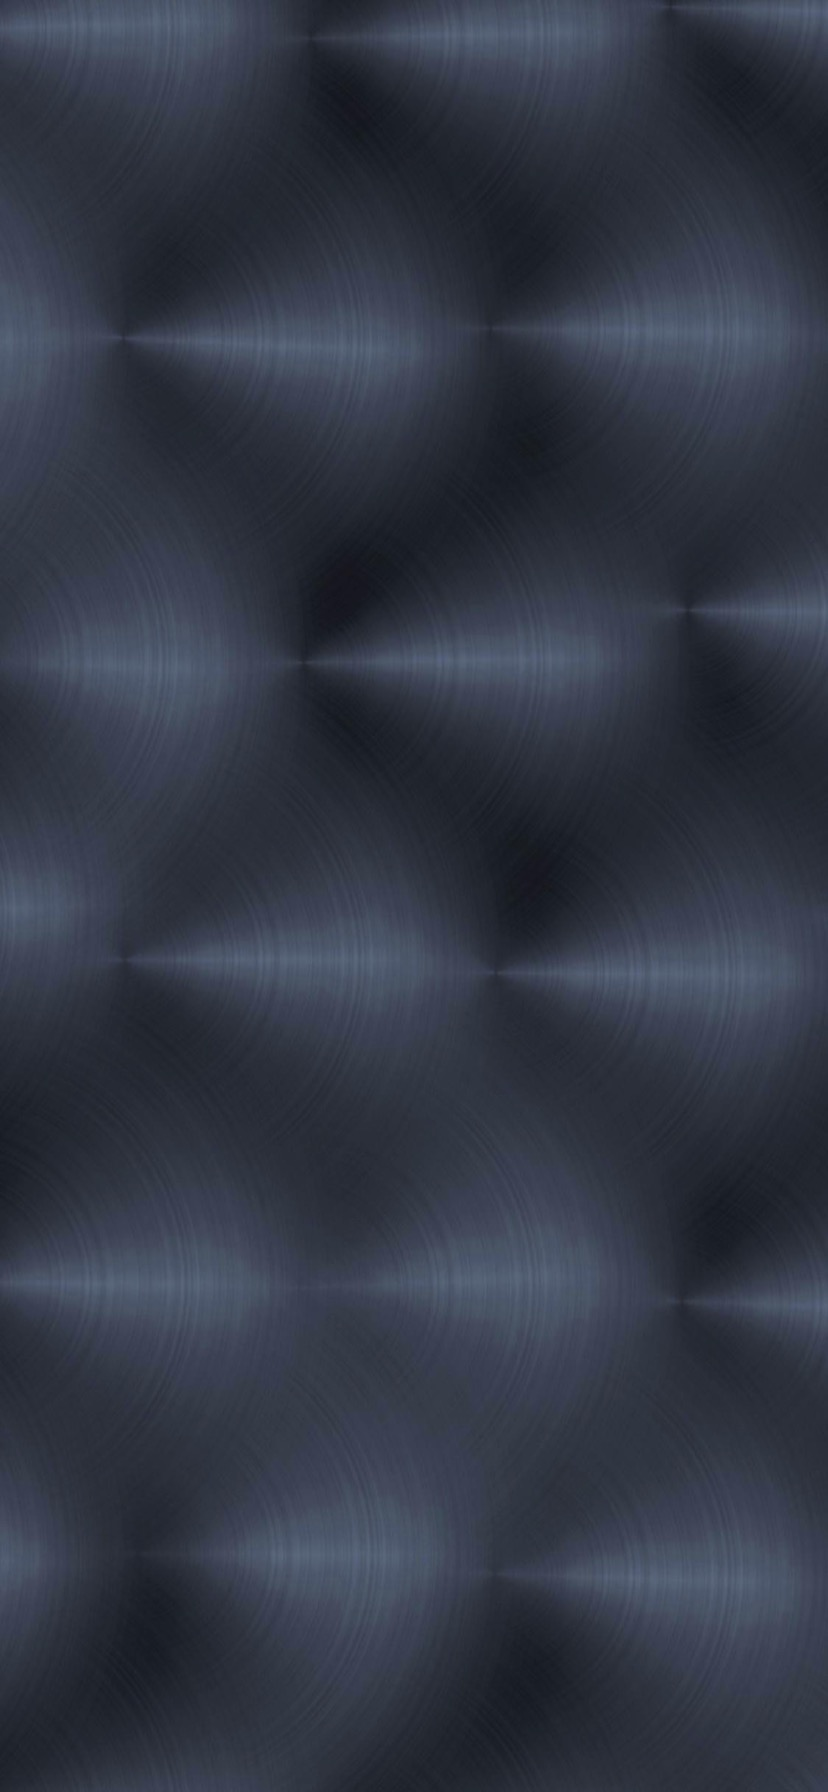 iPhone XR 壁紙 wallpaper 0298